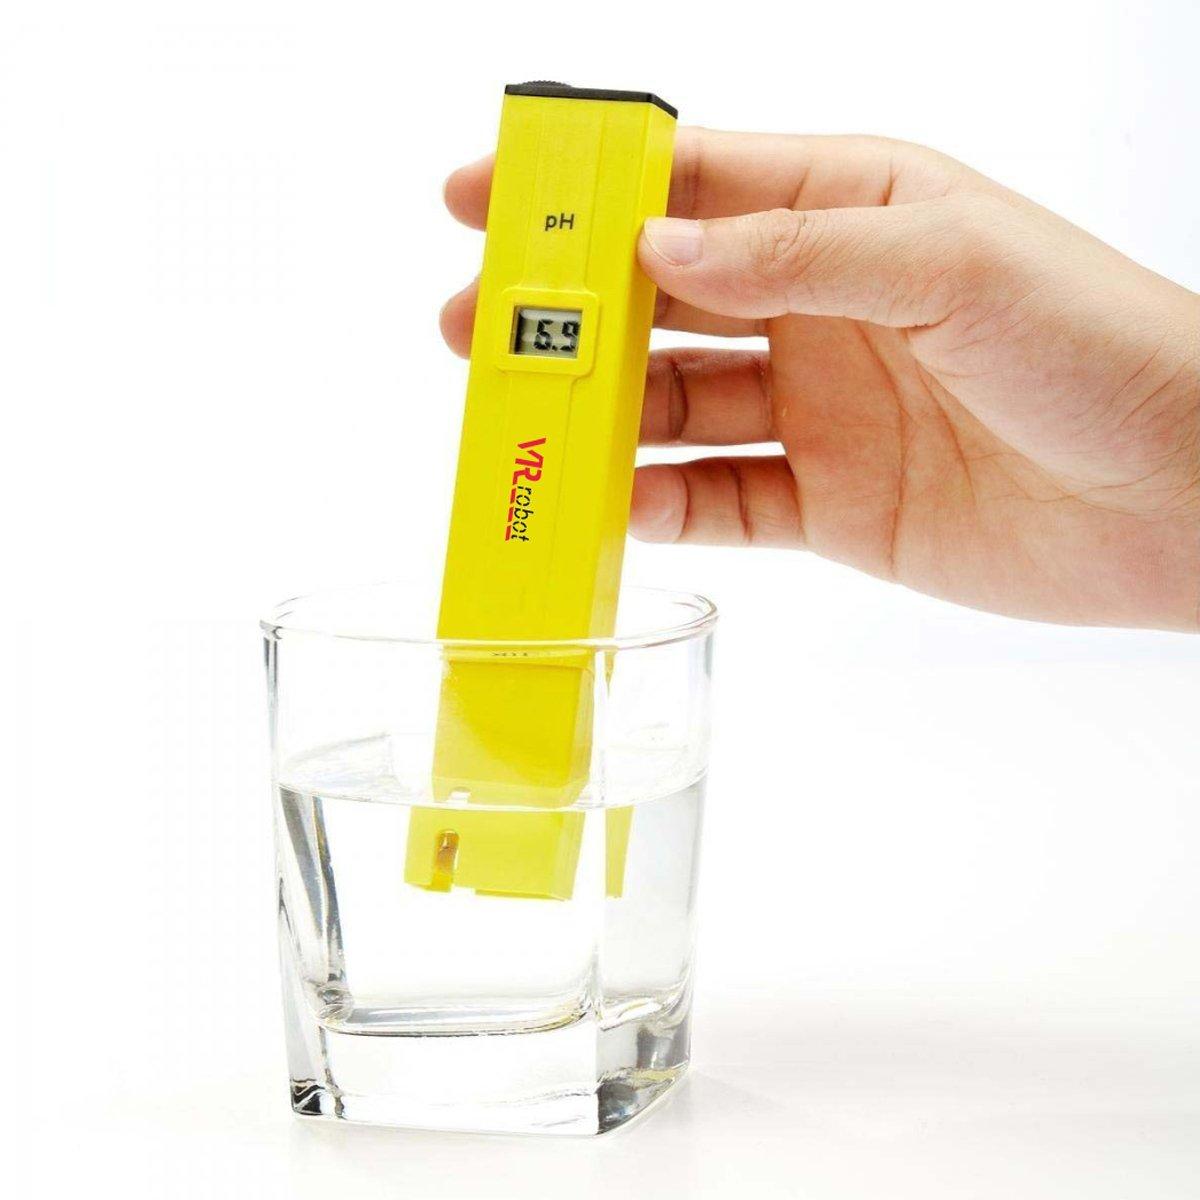 VR-robot Digital PH Meter Tester, PH-009-VR Pocket Pen with PH Buffer Powder , Monitor pH Testing, Aquarium, Water, Swimming Pool, Hydroponics, Kombucha, ph meters Kit(Yellow)